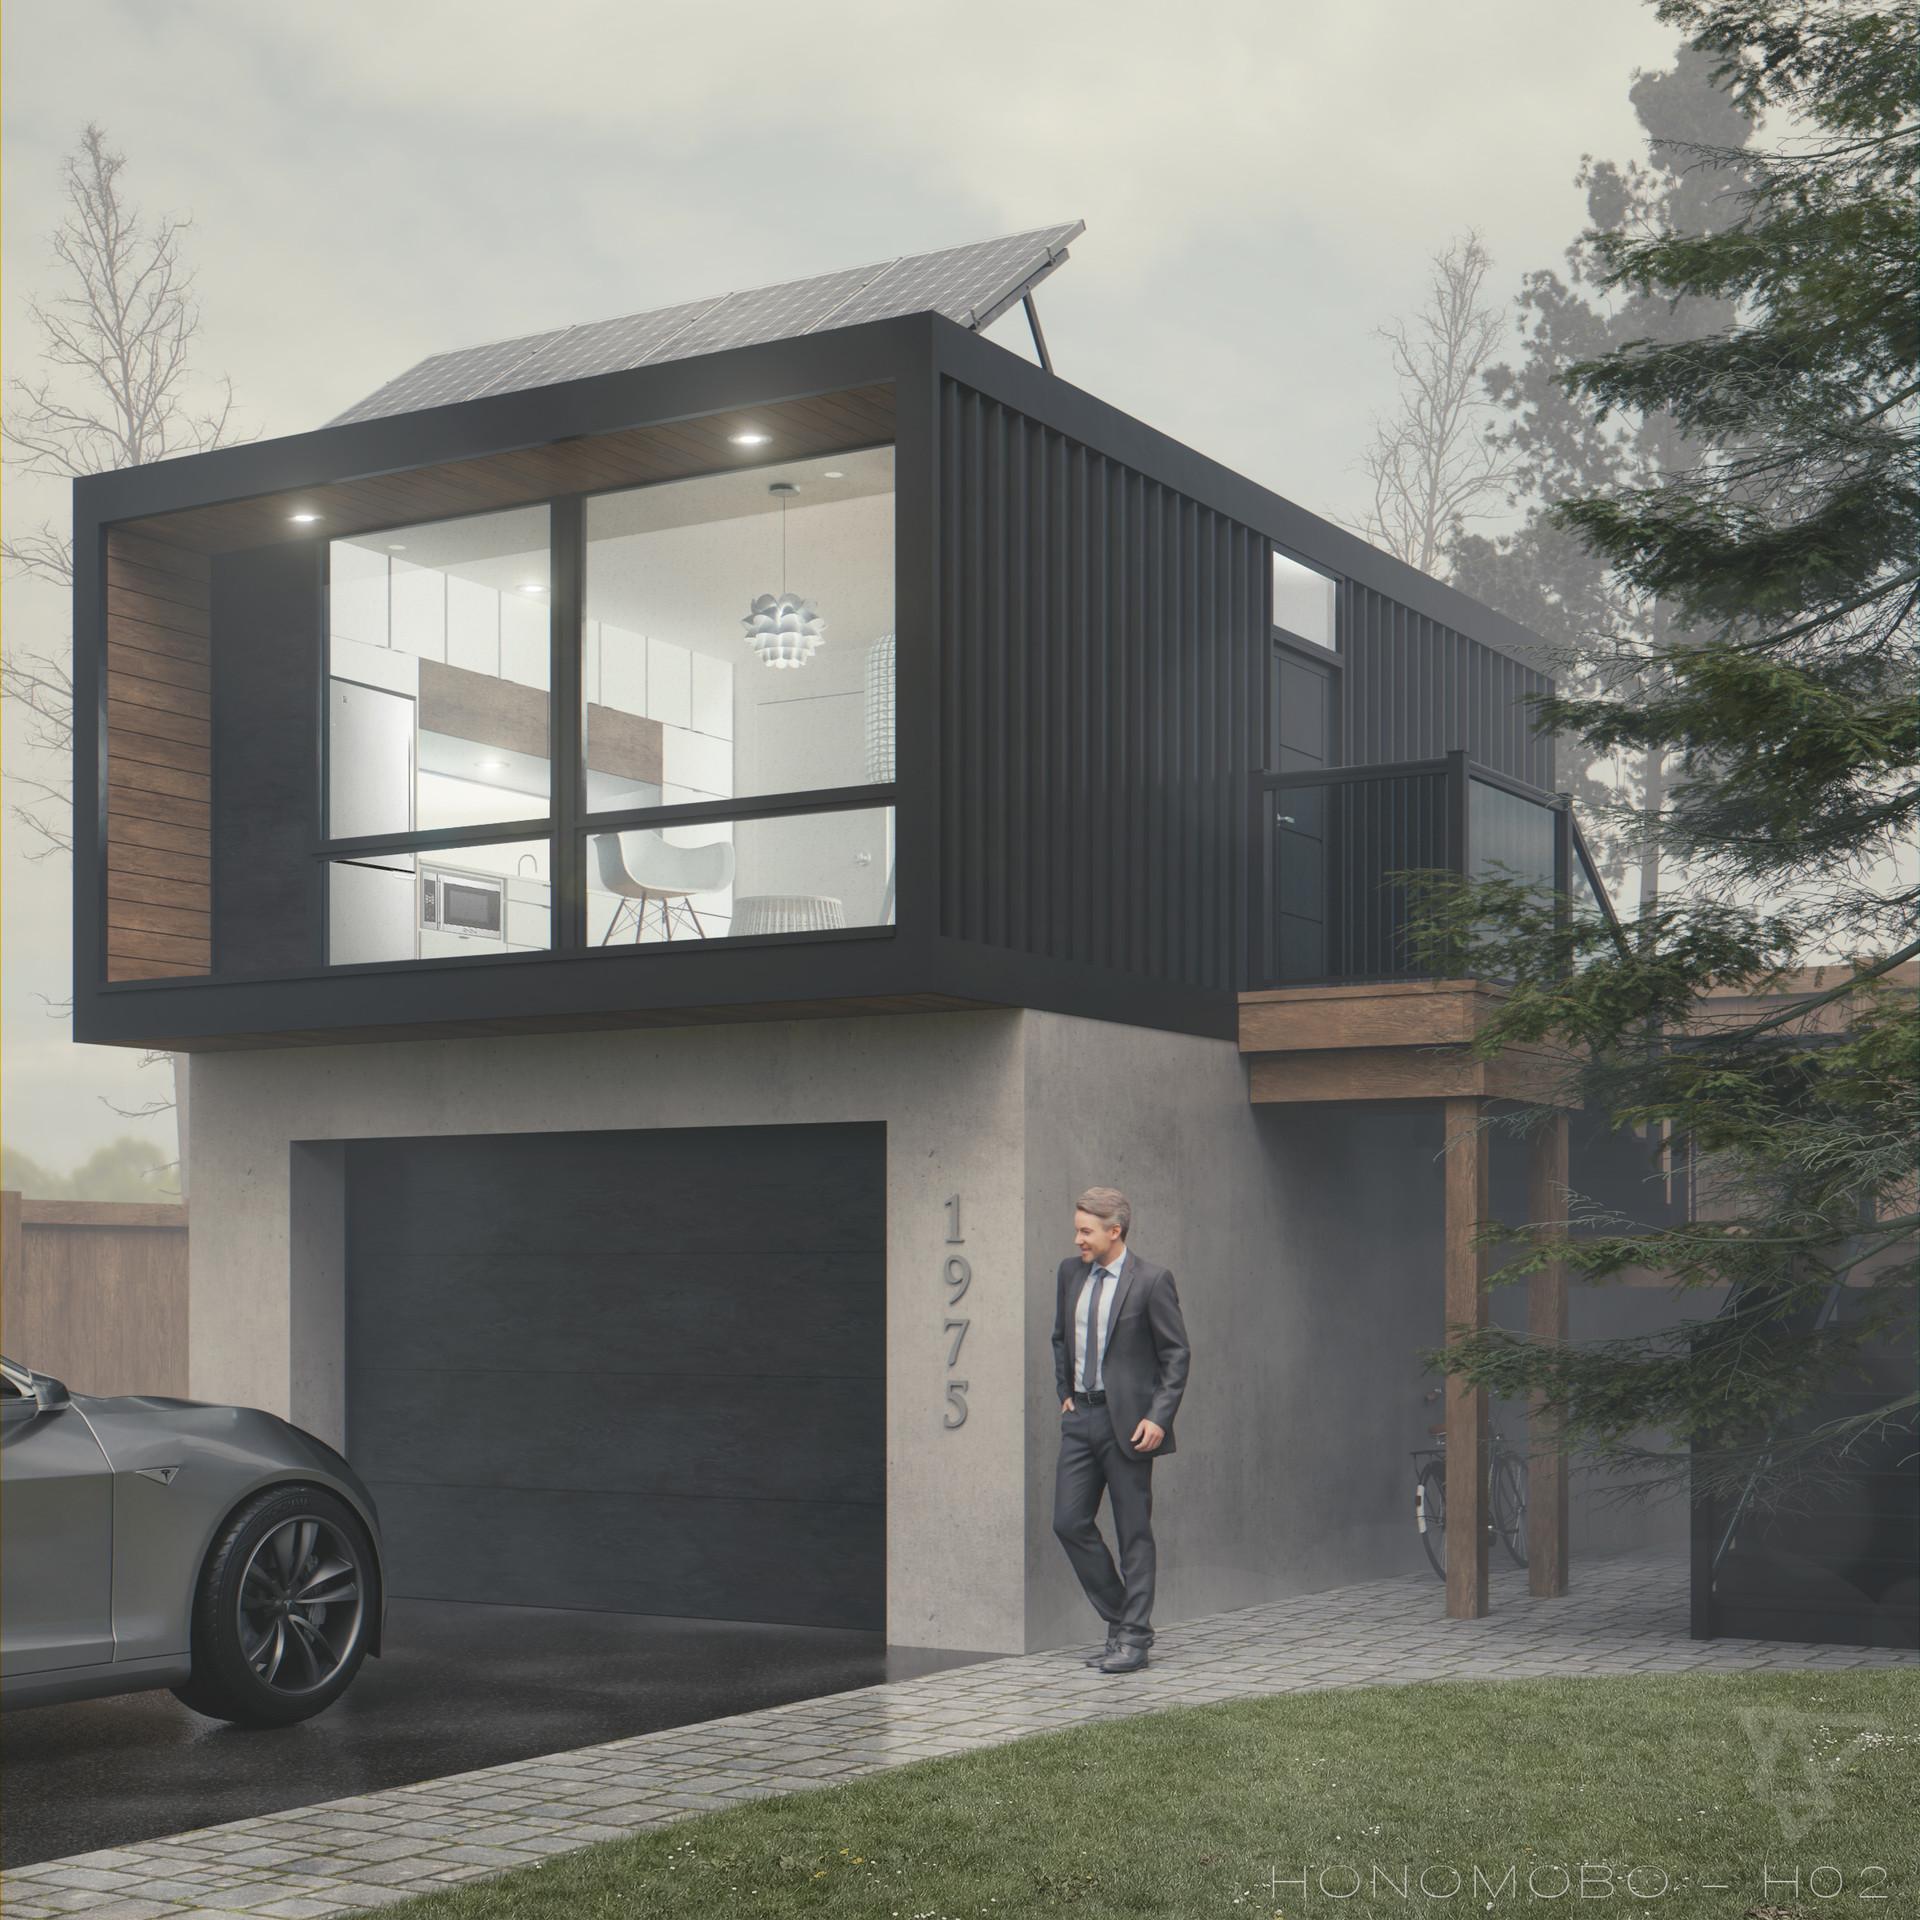 Modern Shipping Container Home artstation - h02 exterior interpretation - honomobo modern